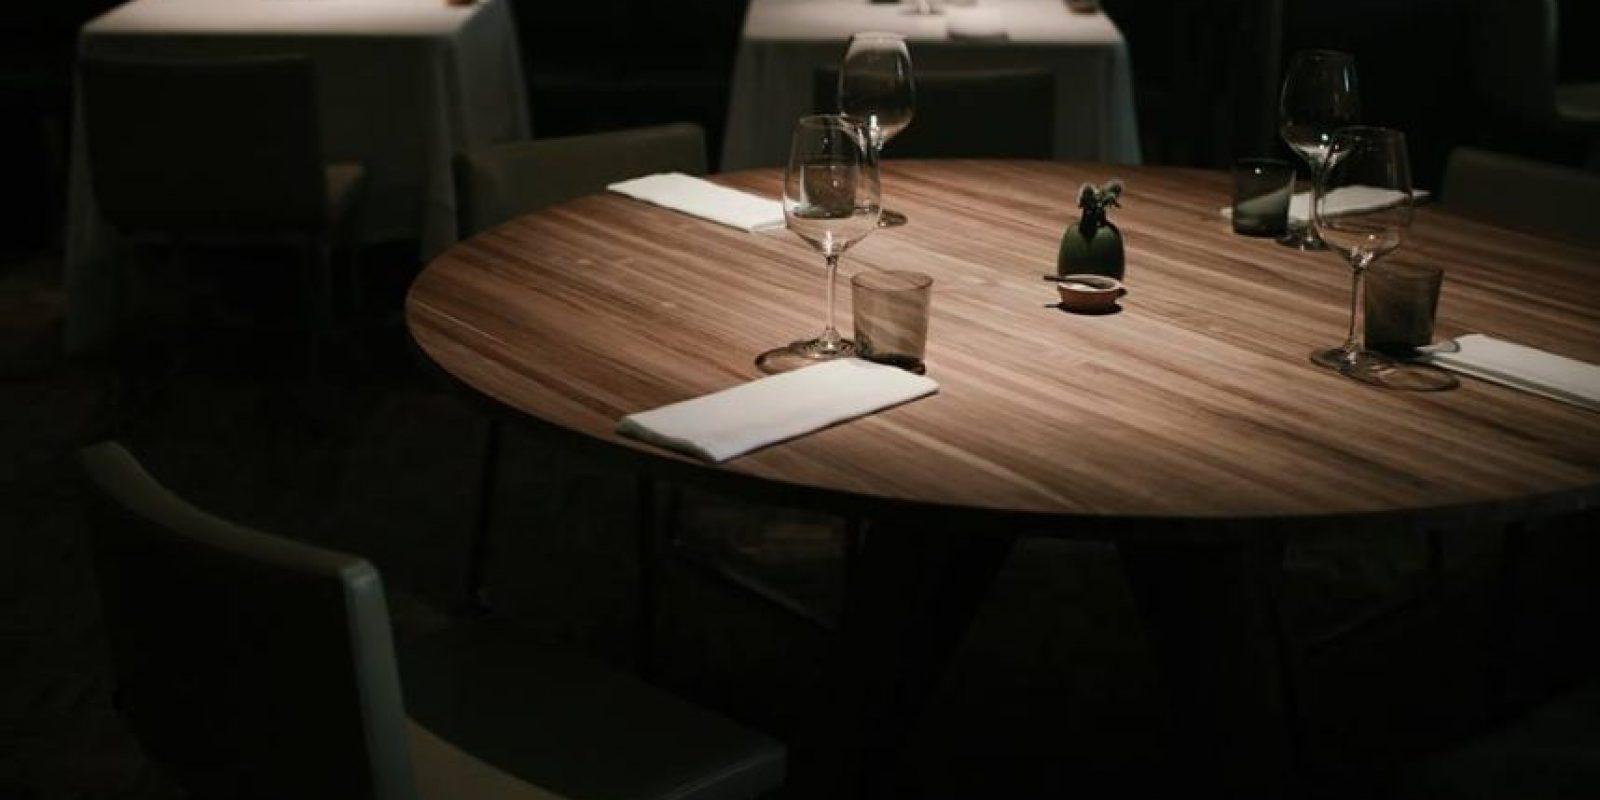 Foto:www.facebook.com/pujolrestaurante